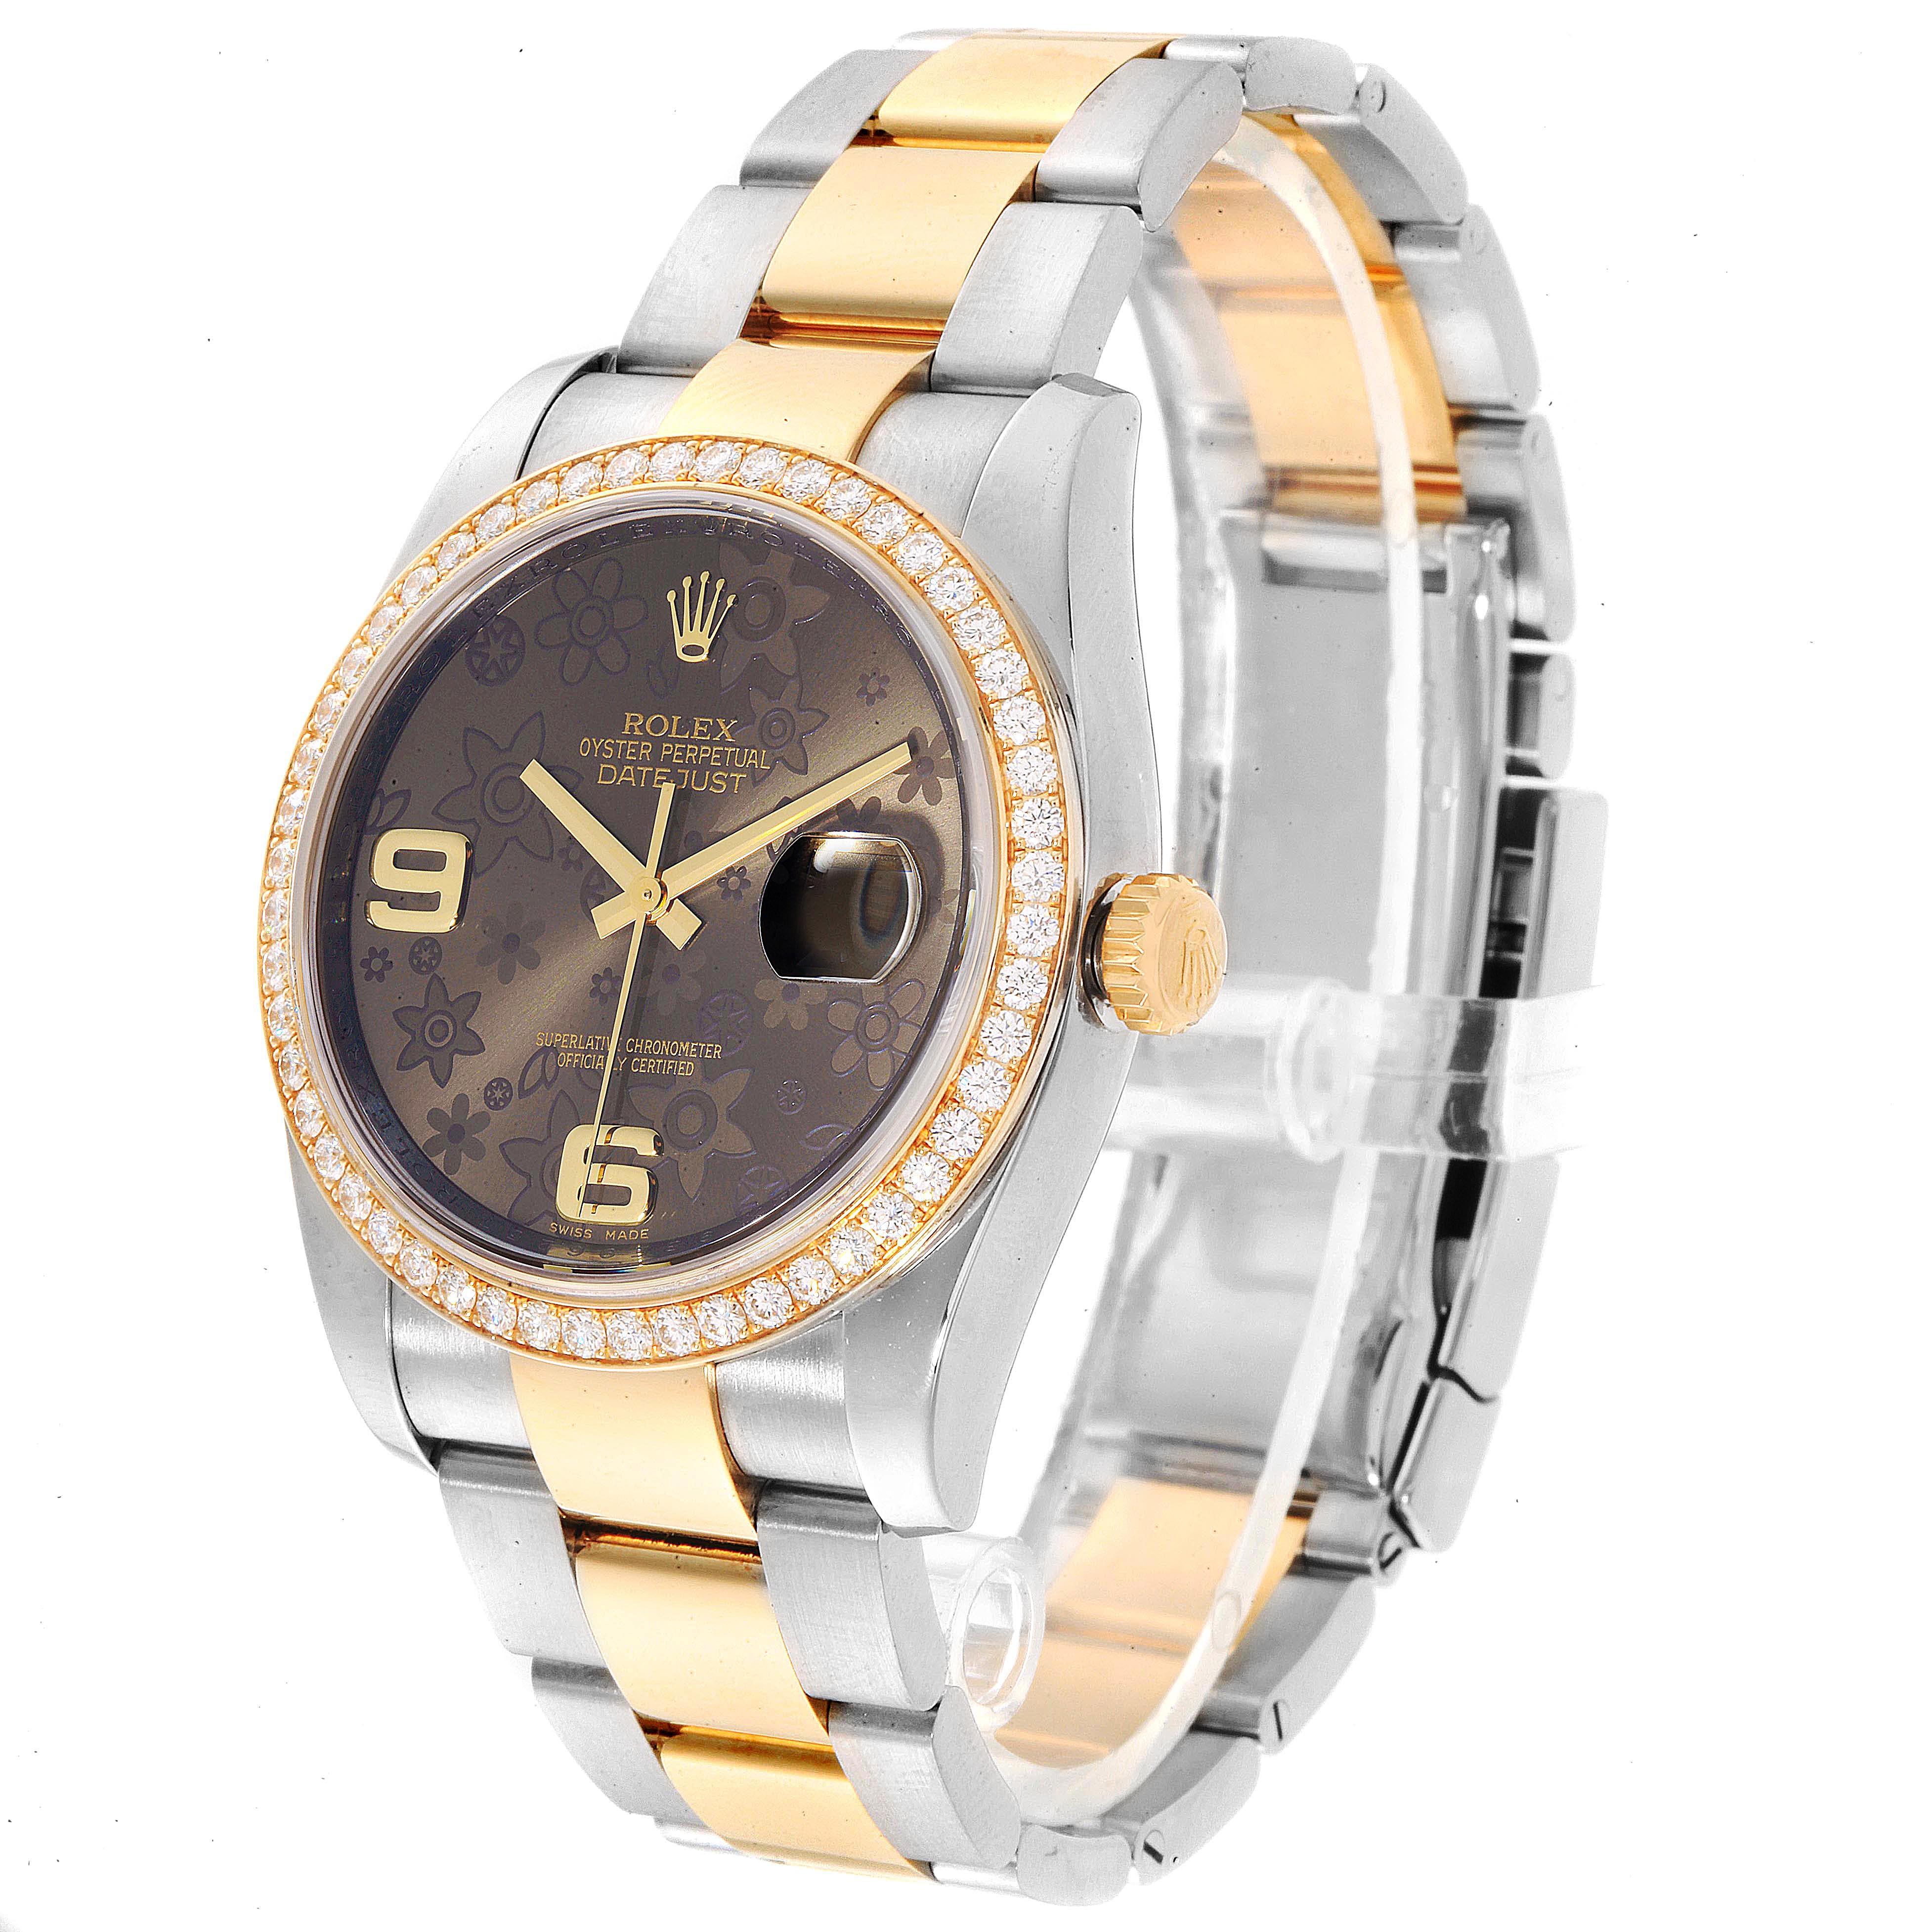 Rolex Datejust 36 Steel Yellow Gold Bronze Flower Dial Watch 116243 SwissWatchExpo